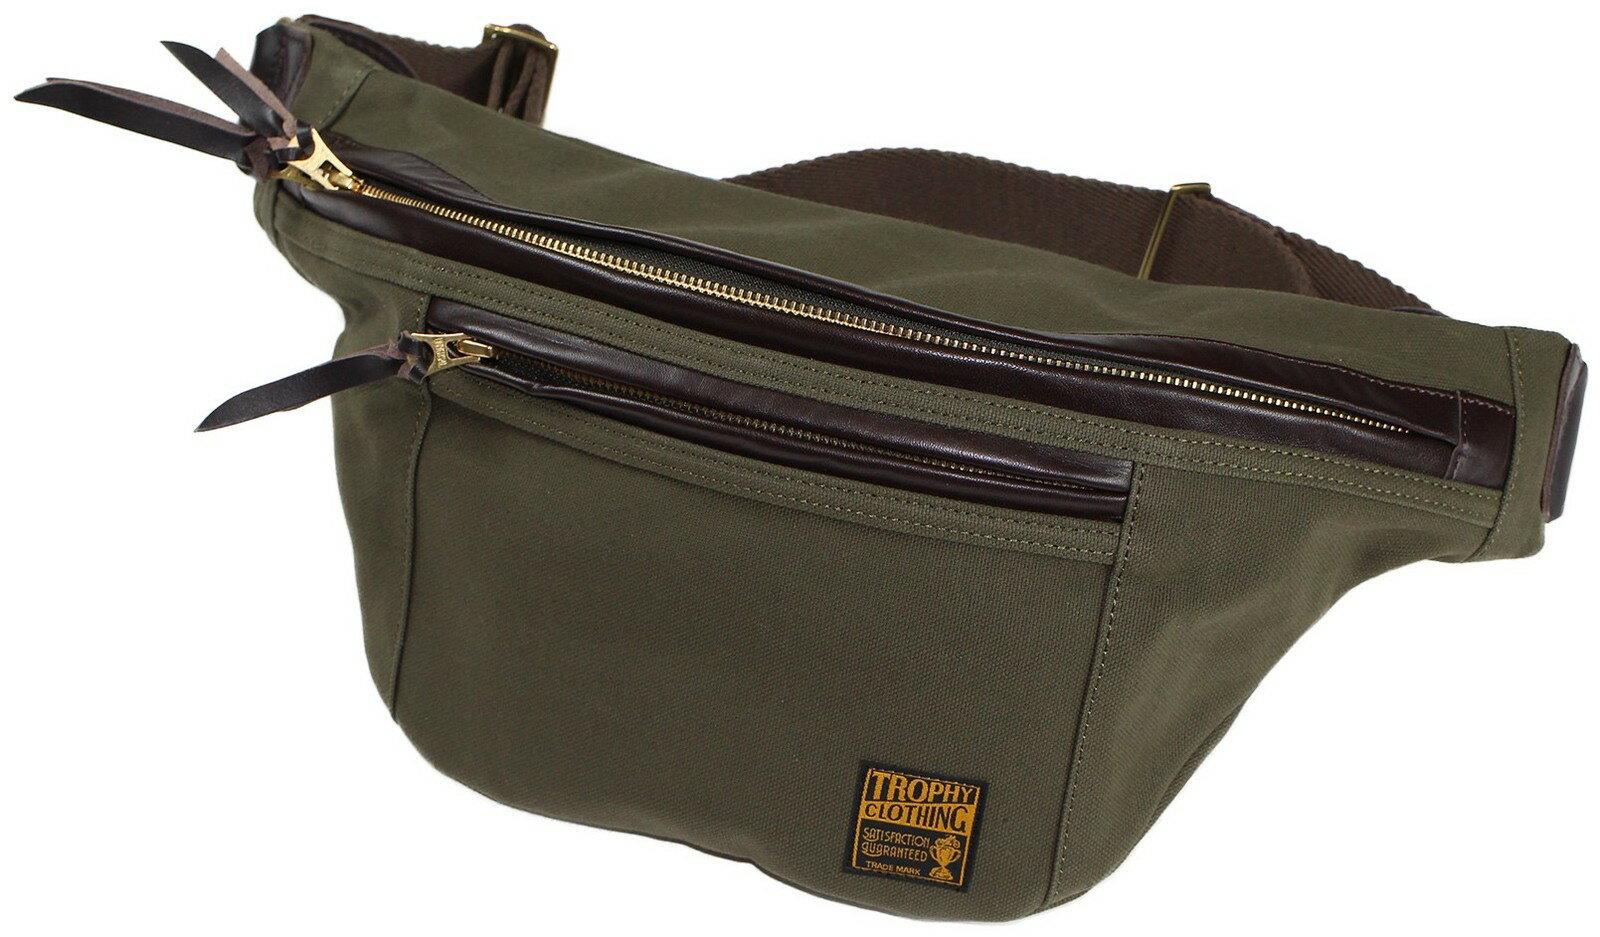 TROPHY CLOTHING [-Day Trip Bag- Olive]